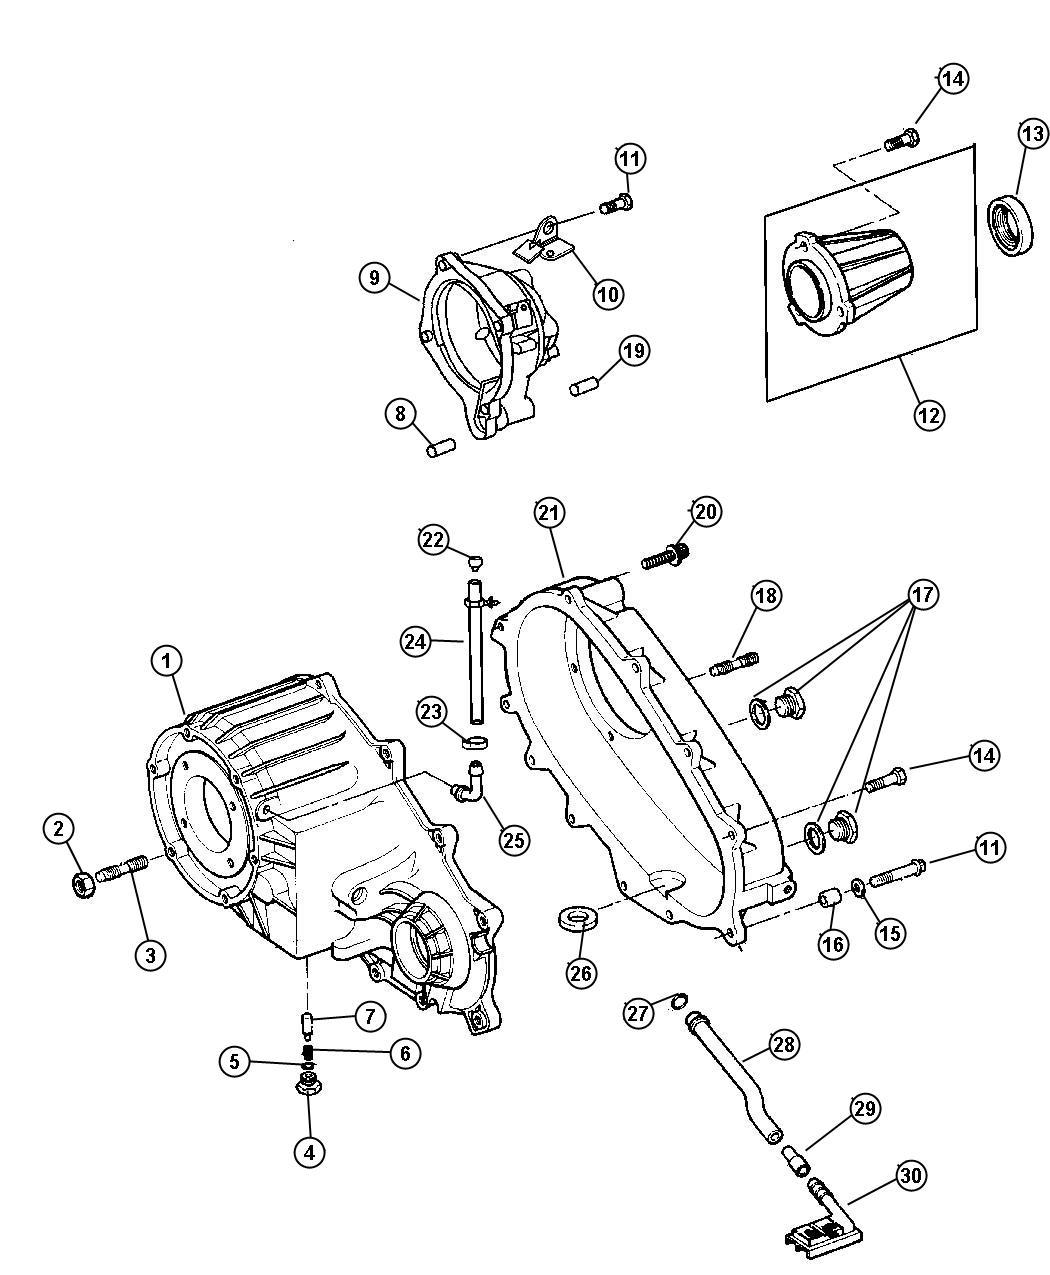 Dodge Dakota Case Transfer Front Elecshiftontheflyftime